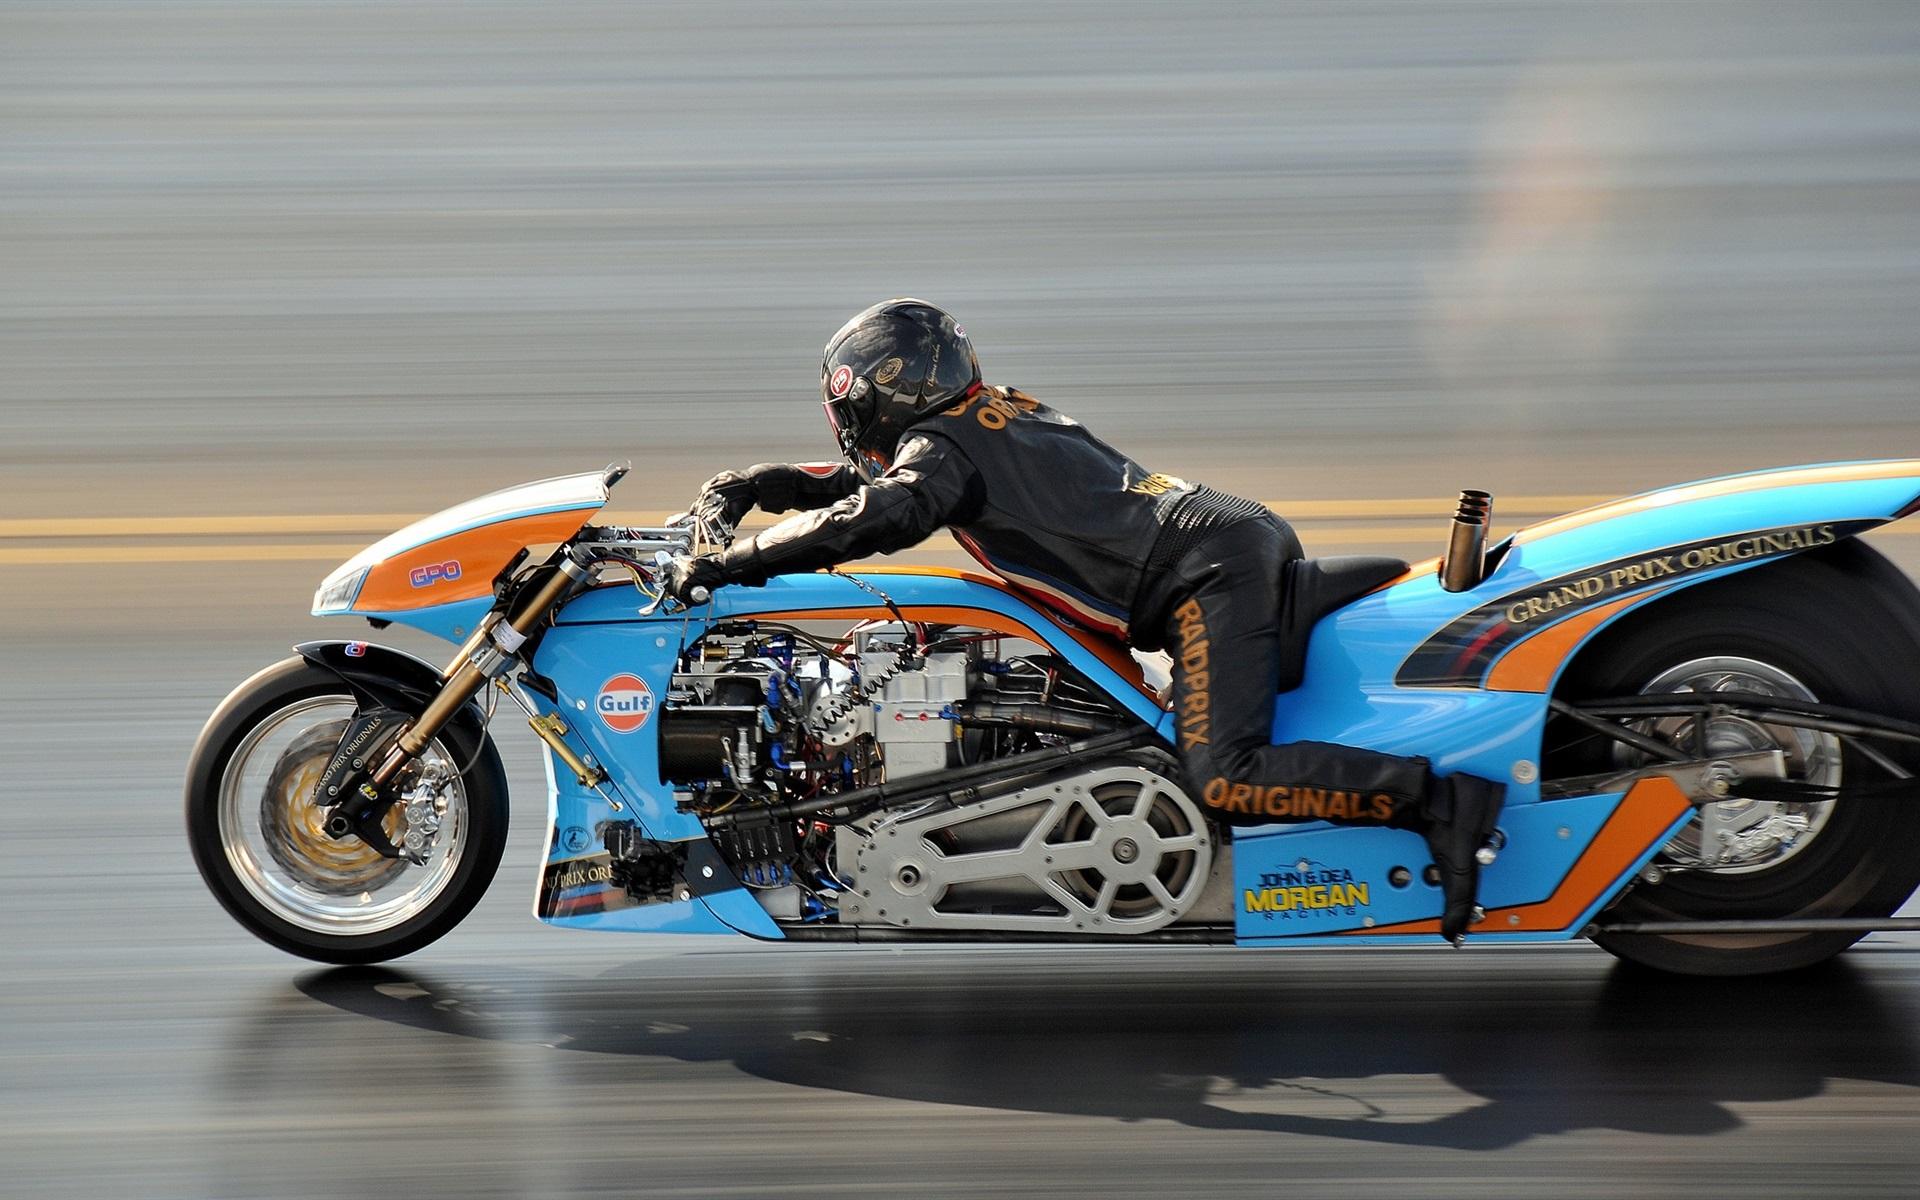 Wallpaper motorcycle speed drag racing 1920x1200 hd - Drag race wallpaper ...